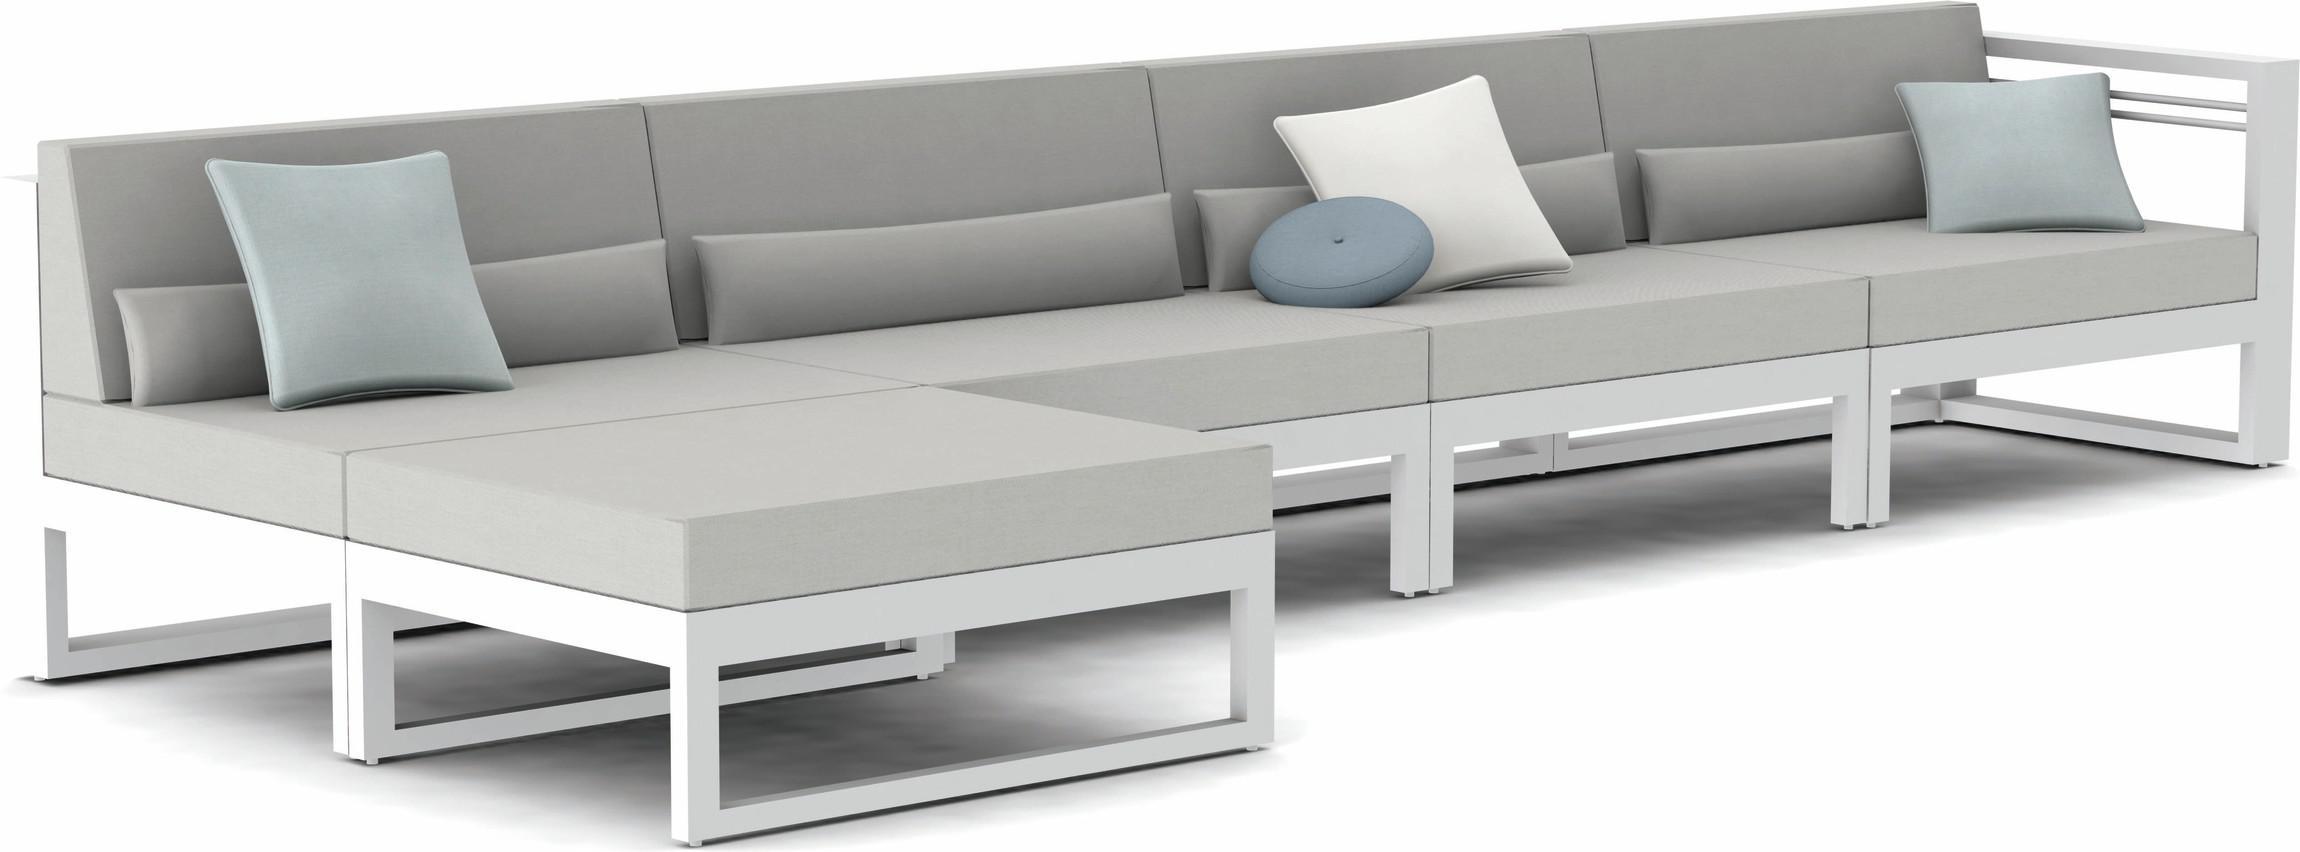 Fuse Concept 4 - wit - textiles white - links